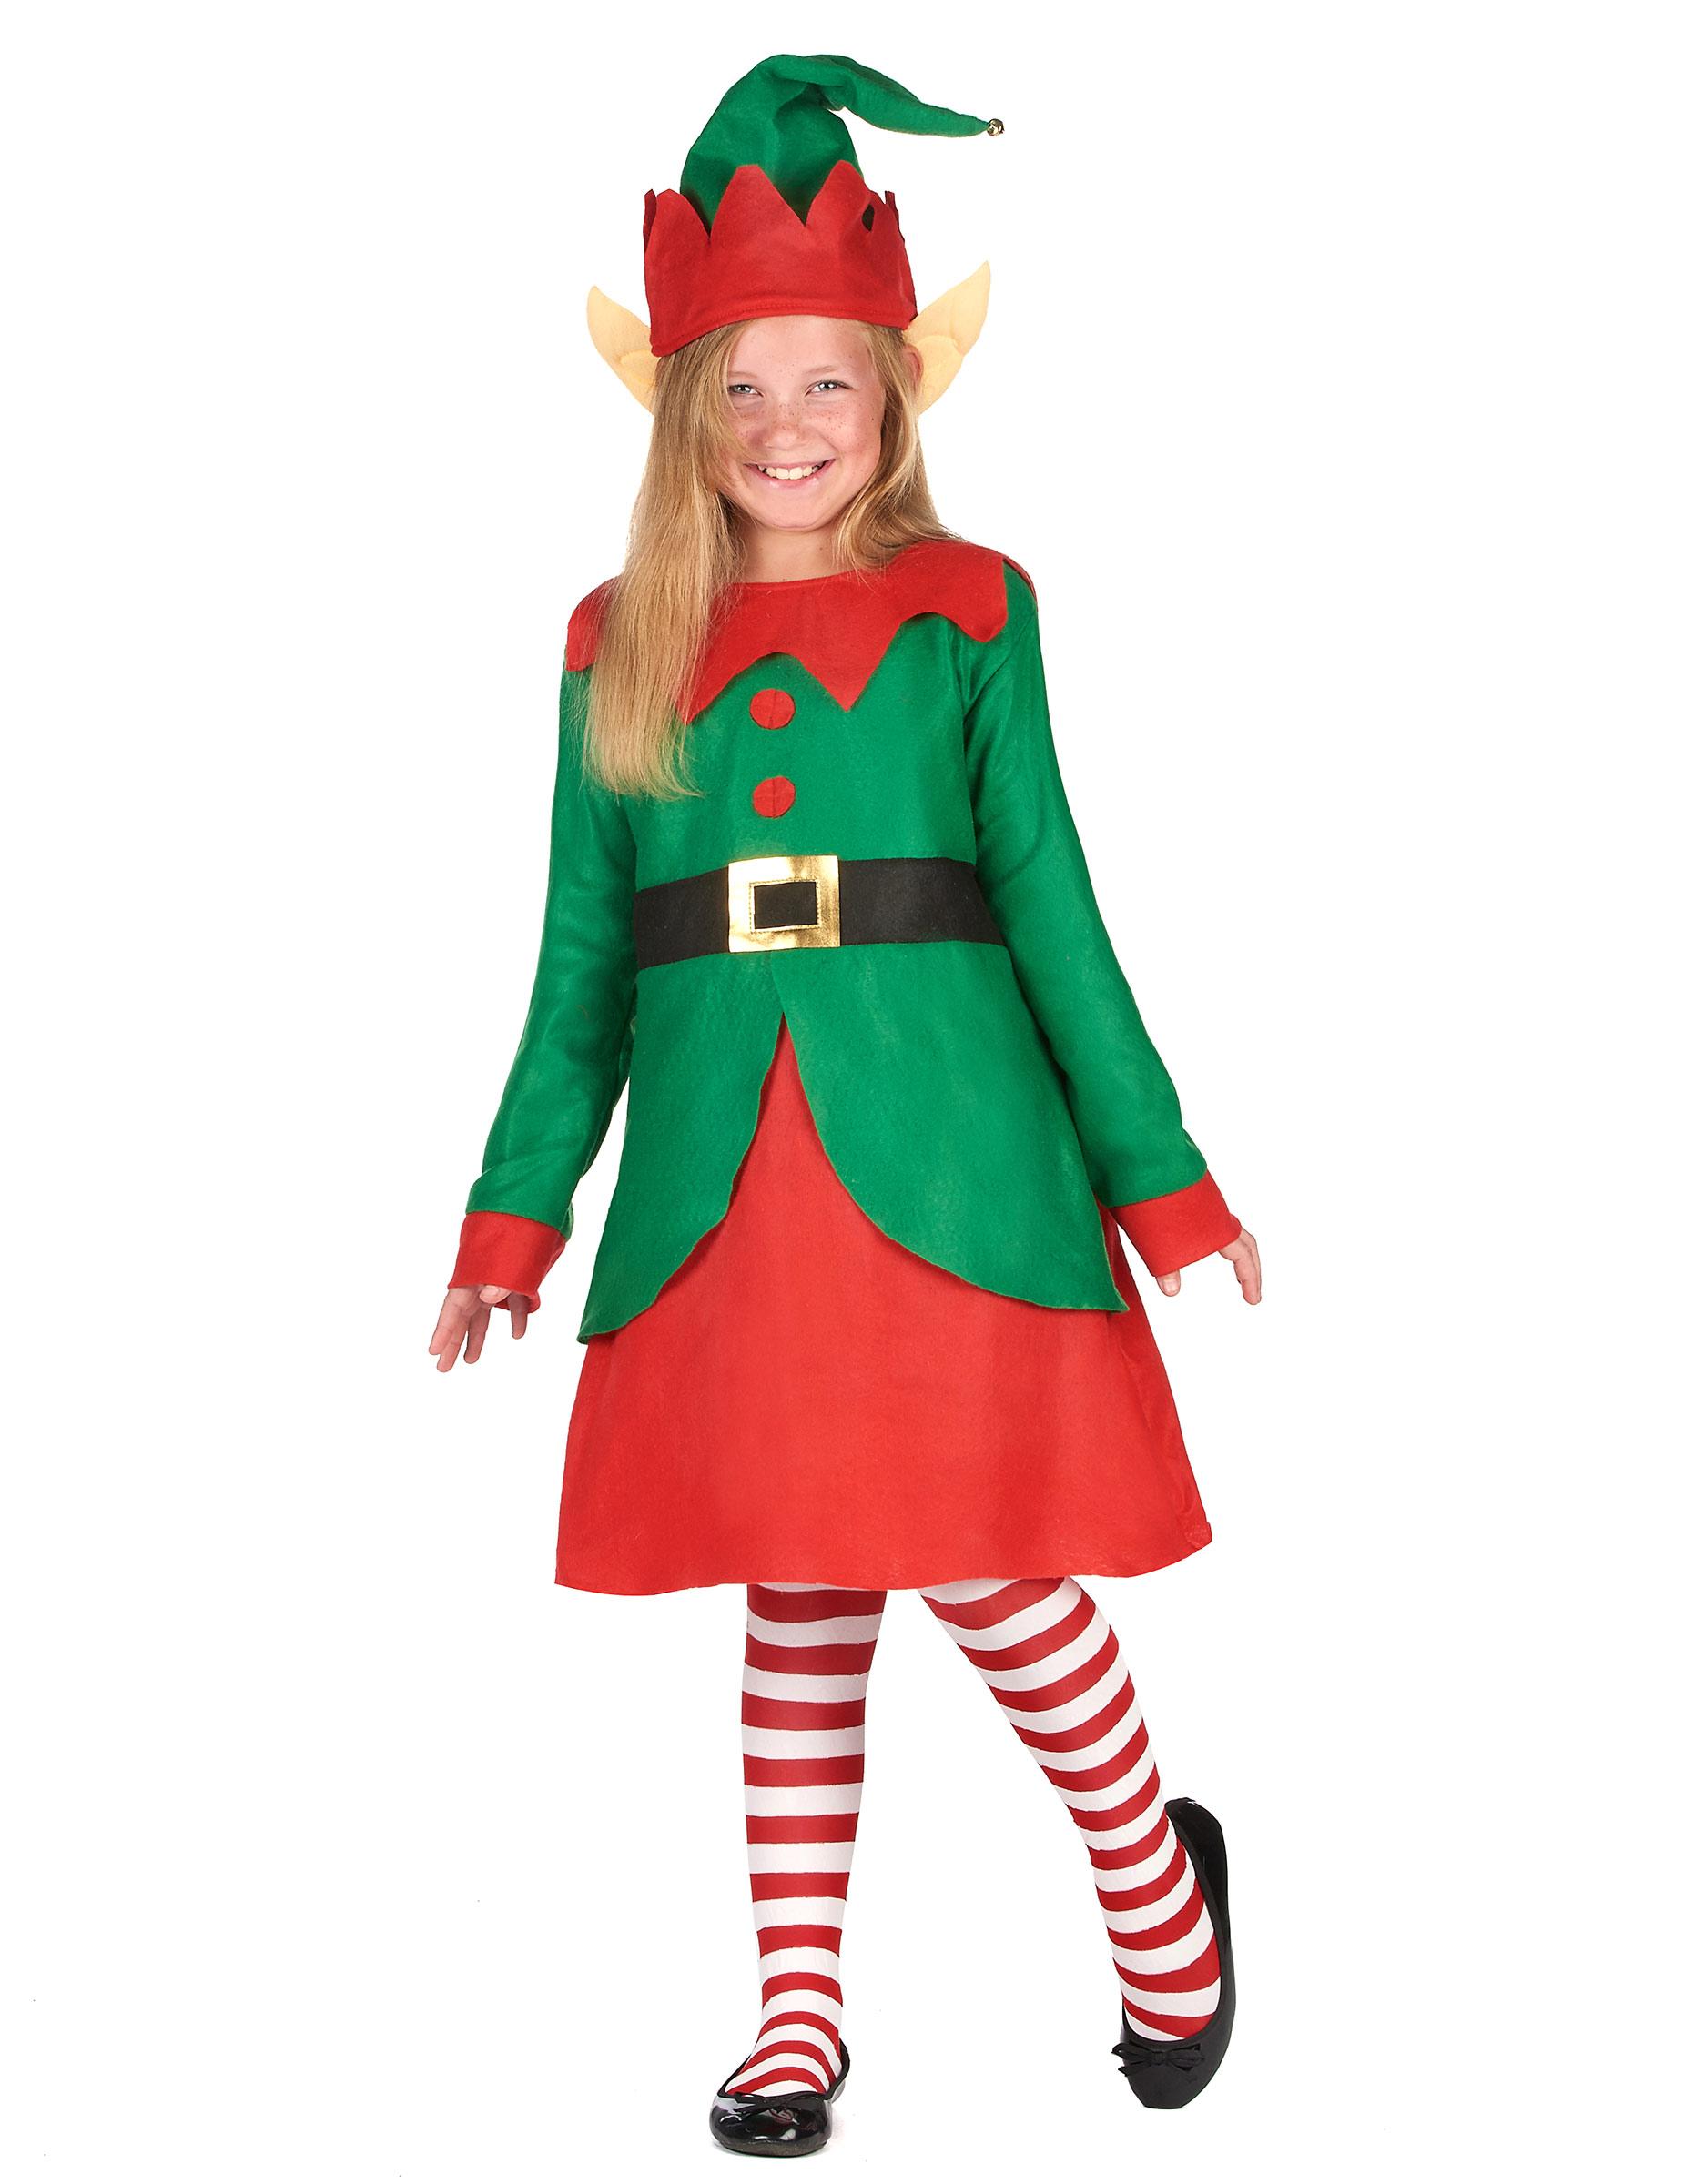 9a9cb40a59a Déguisement robe elfe de Noël fille